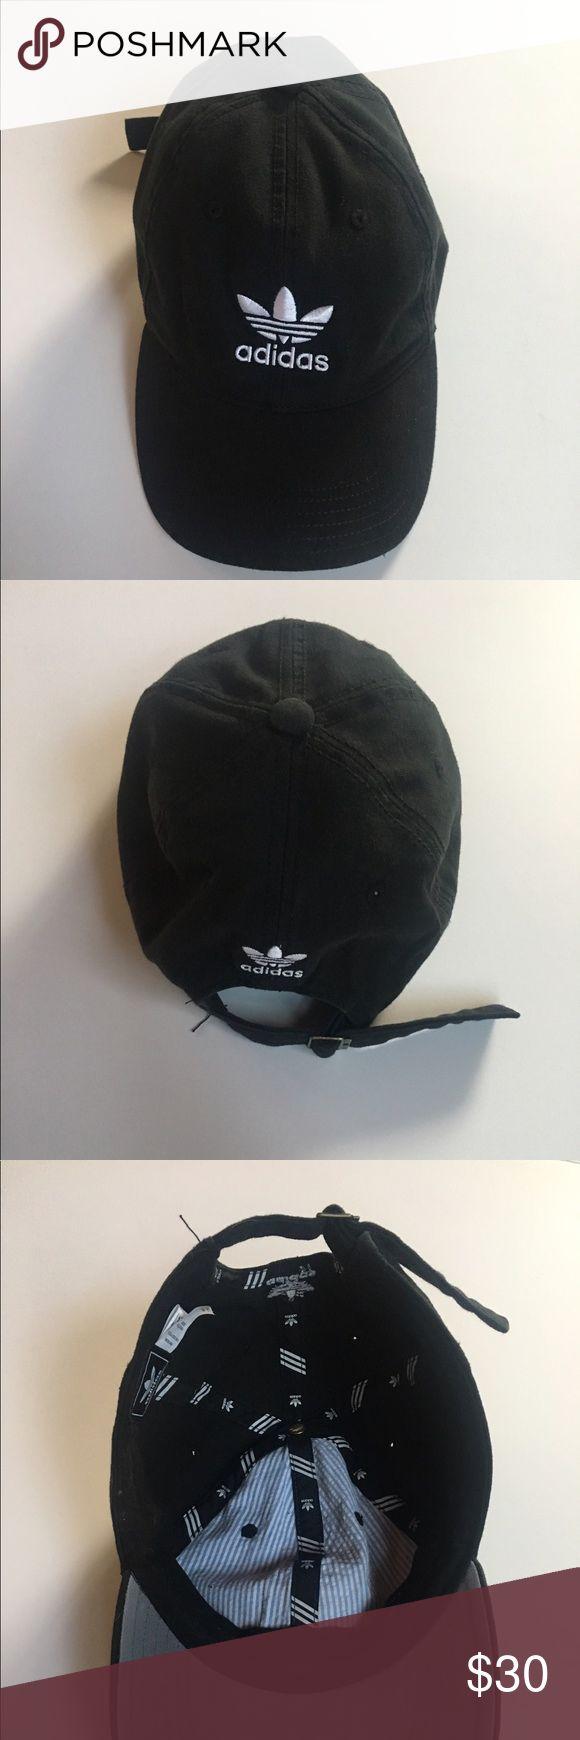 Adidas baseball cap Black and white baseball cap adjustable to fit adidas Accessories Hats